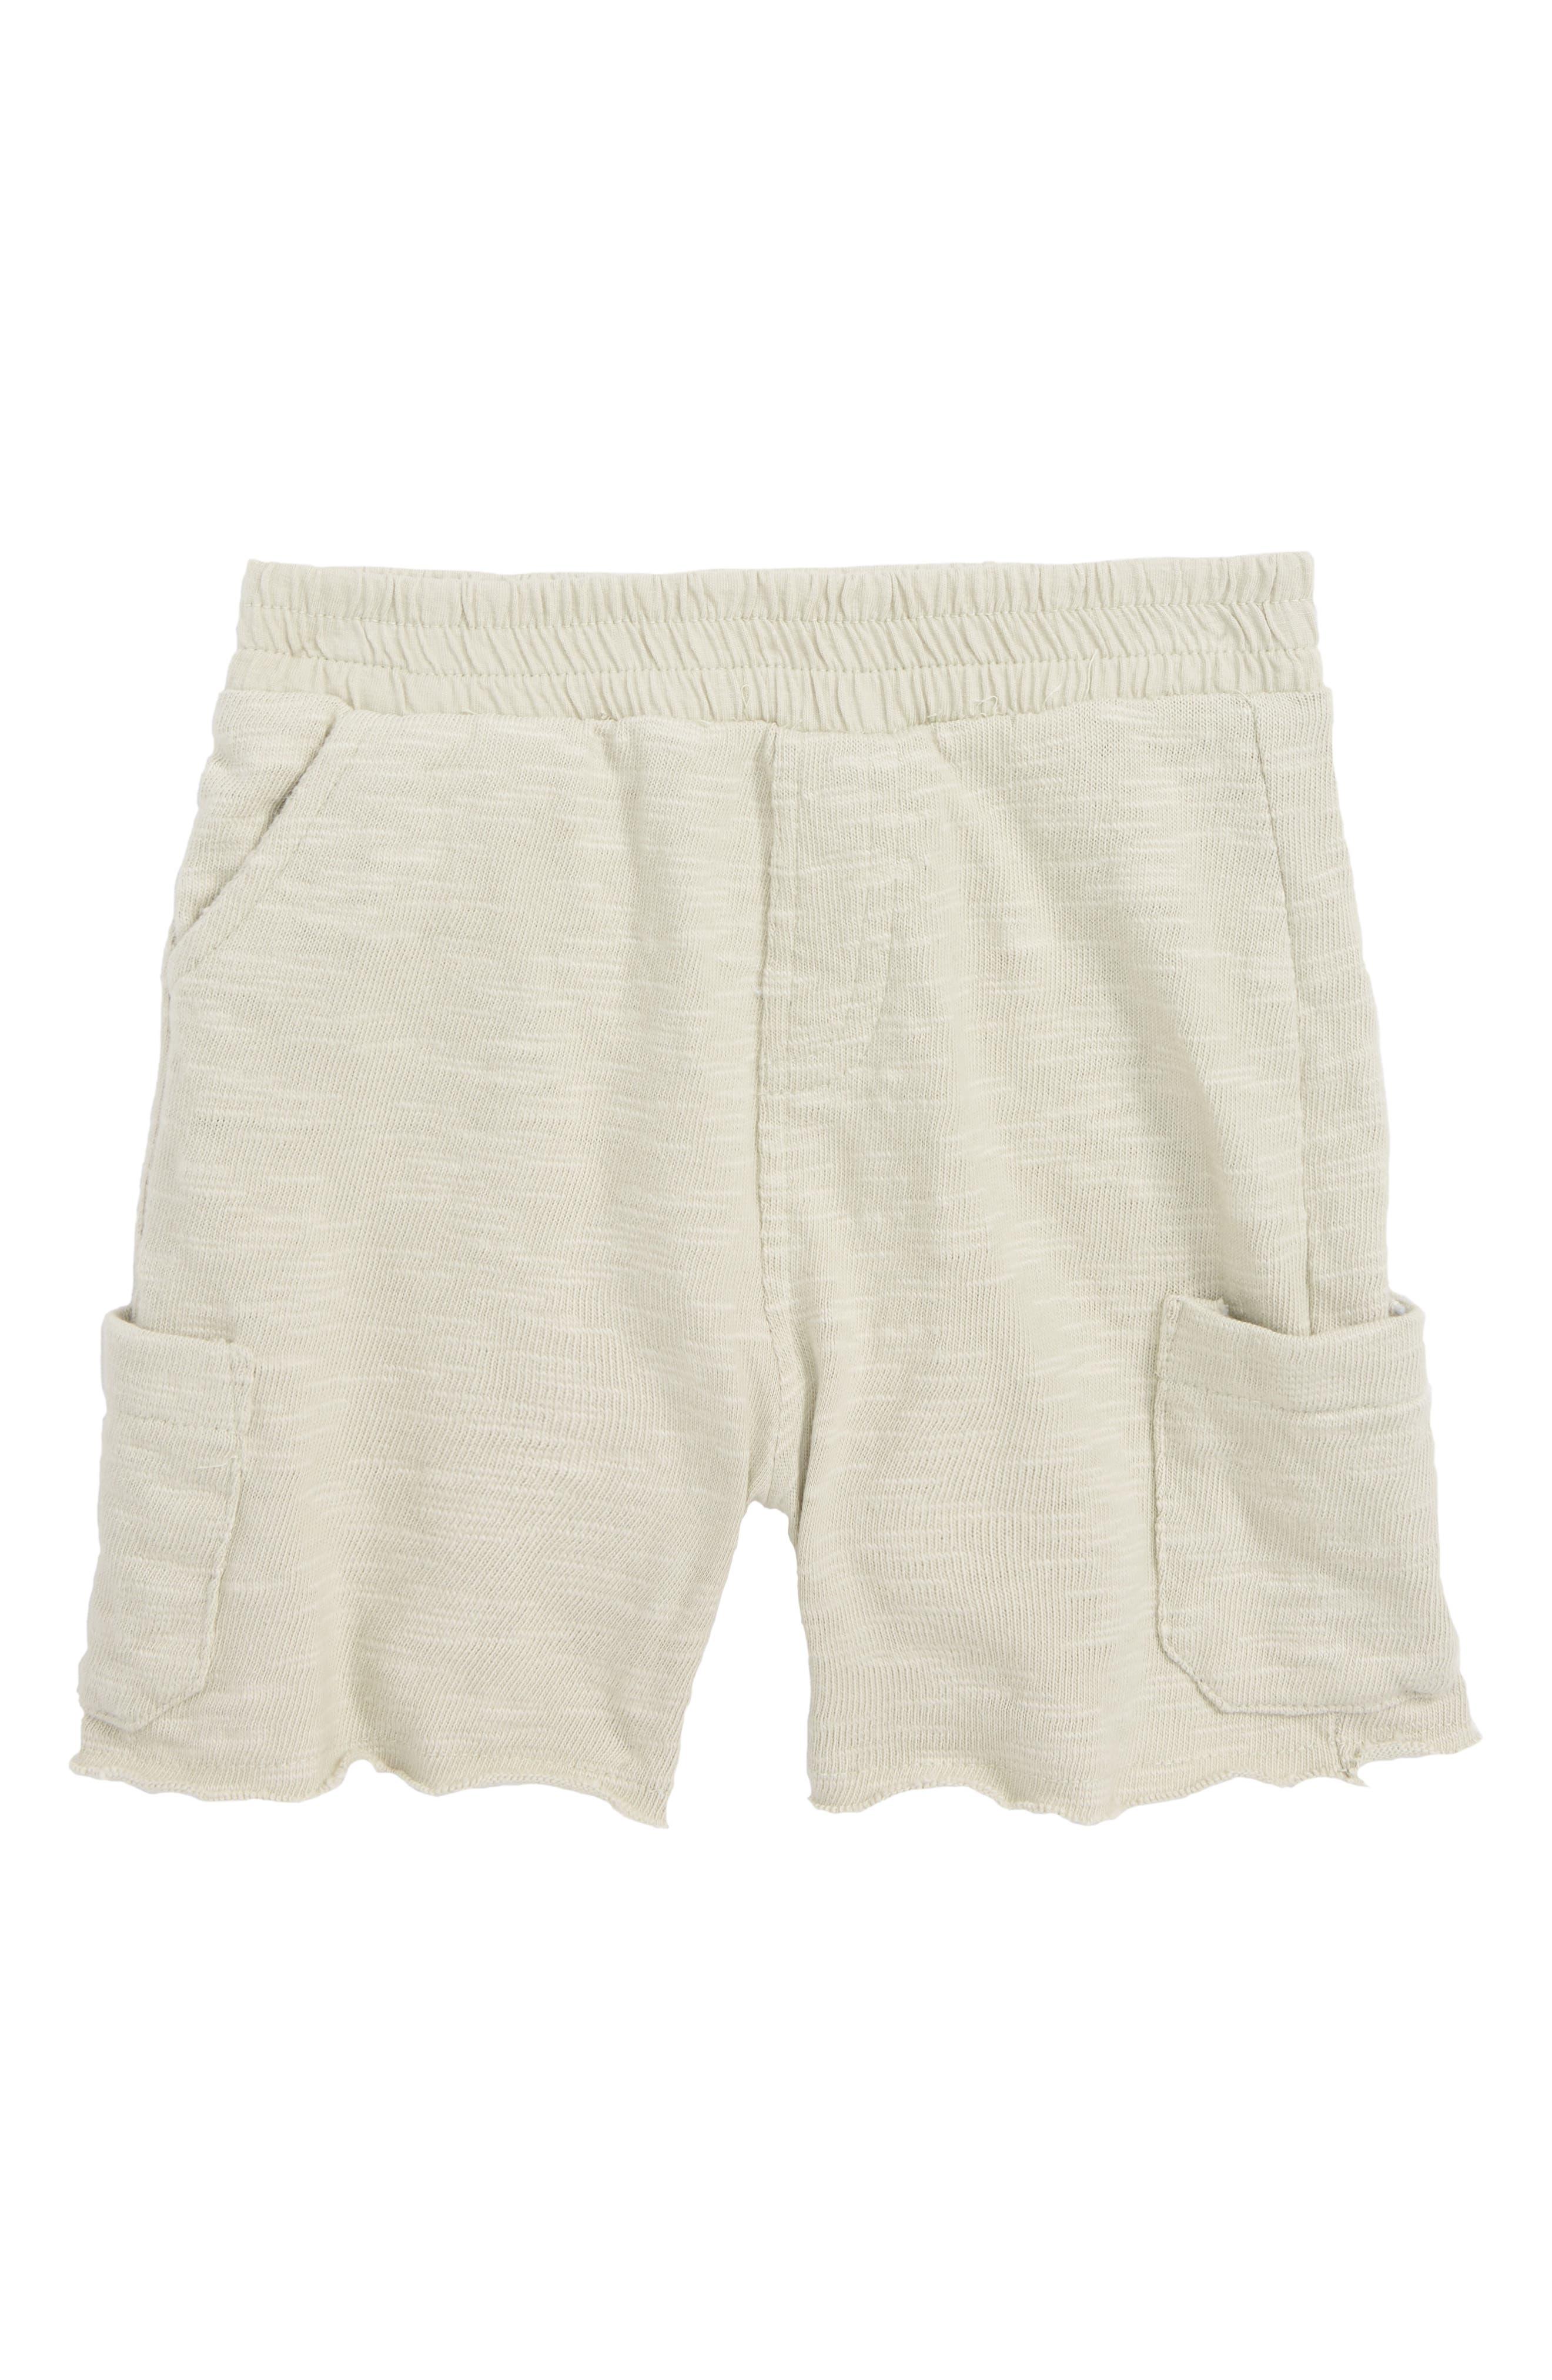 Asher Knit Cargo Shorts,                             Main thumbnail 1, color,                             020